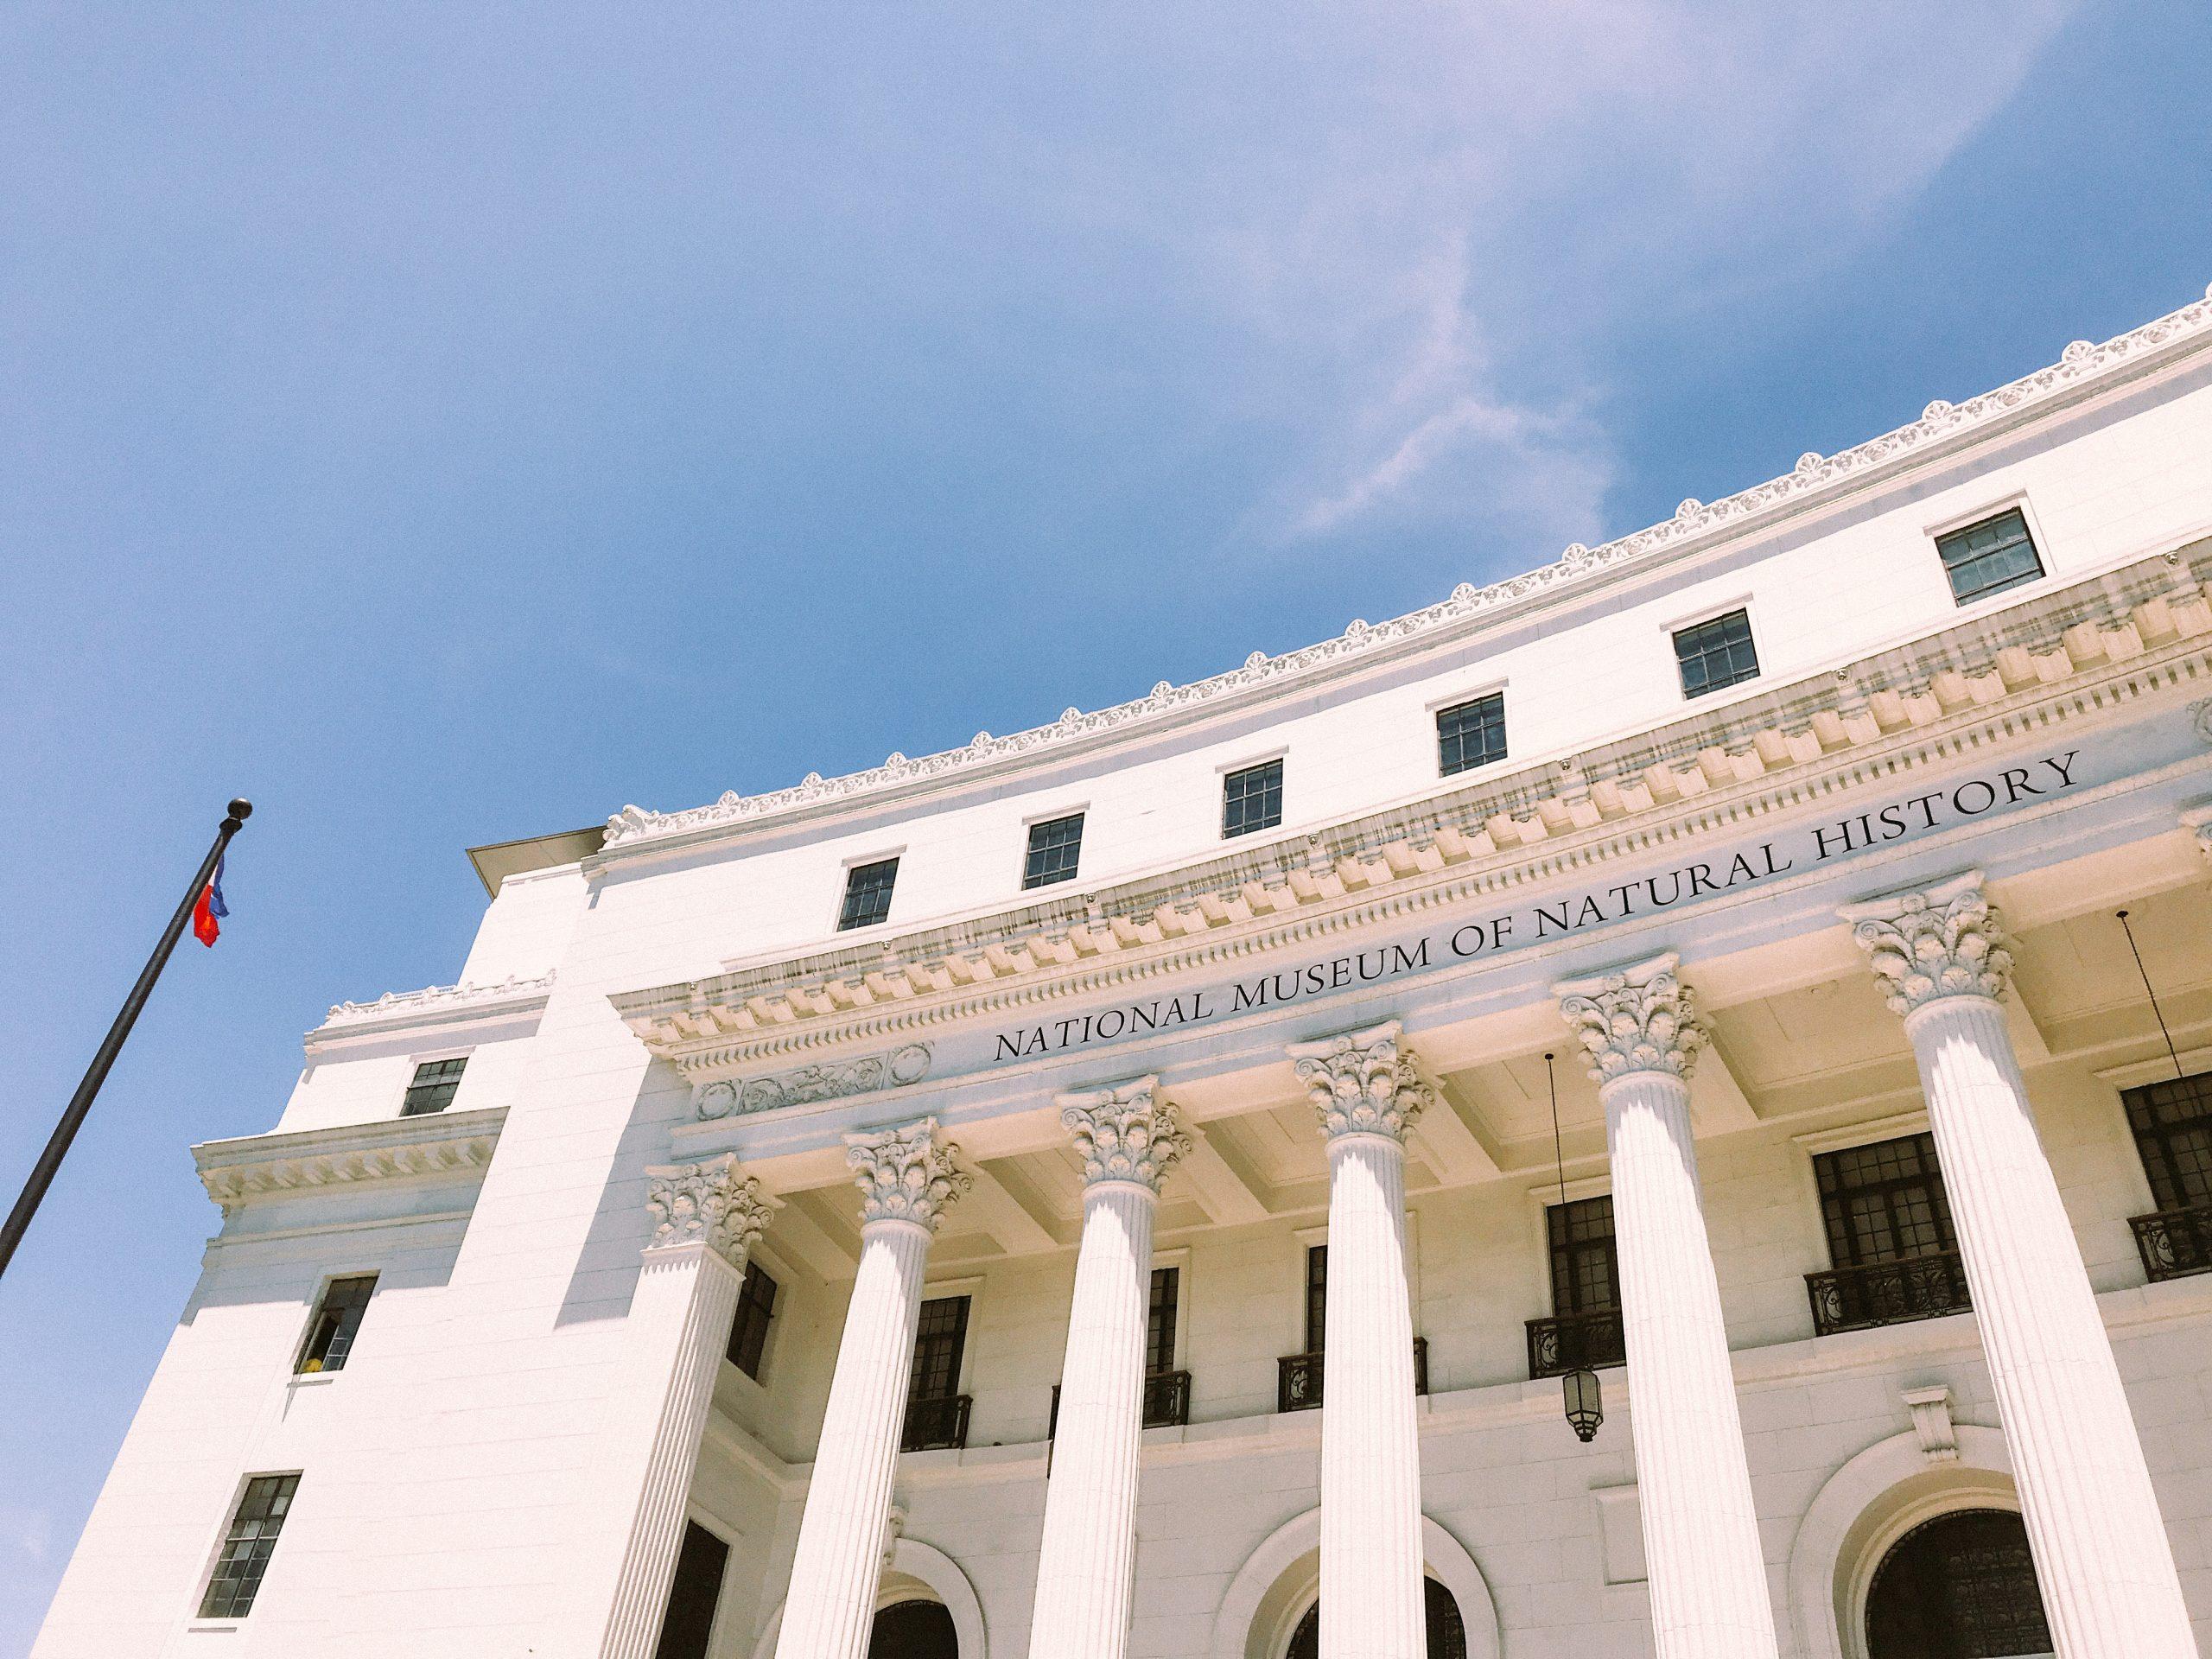 Natl museum of natural history